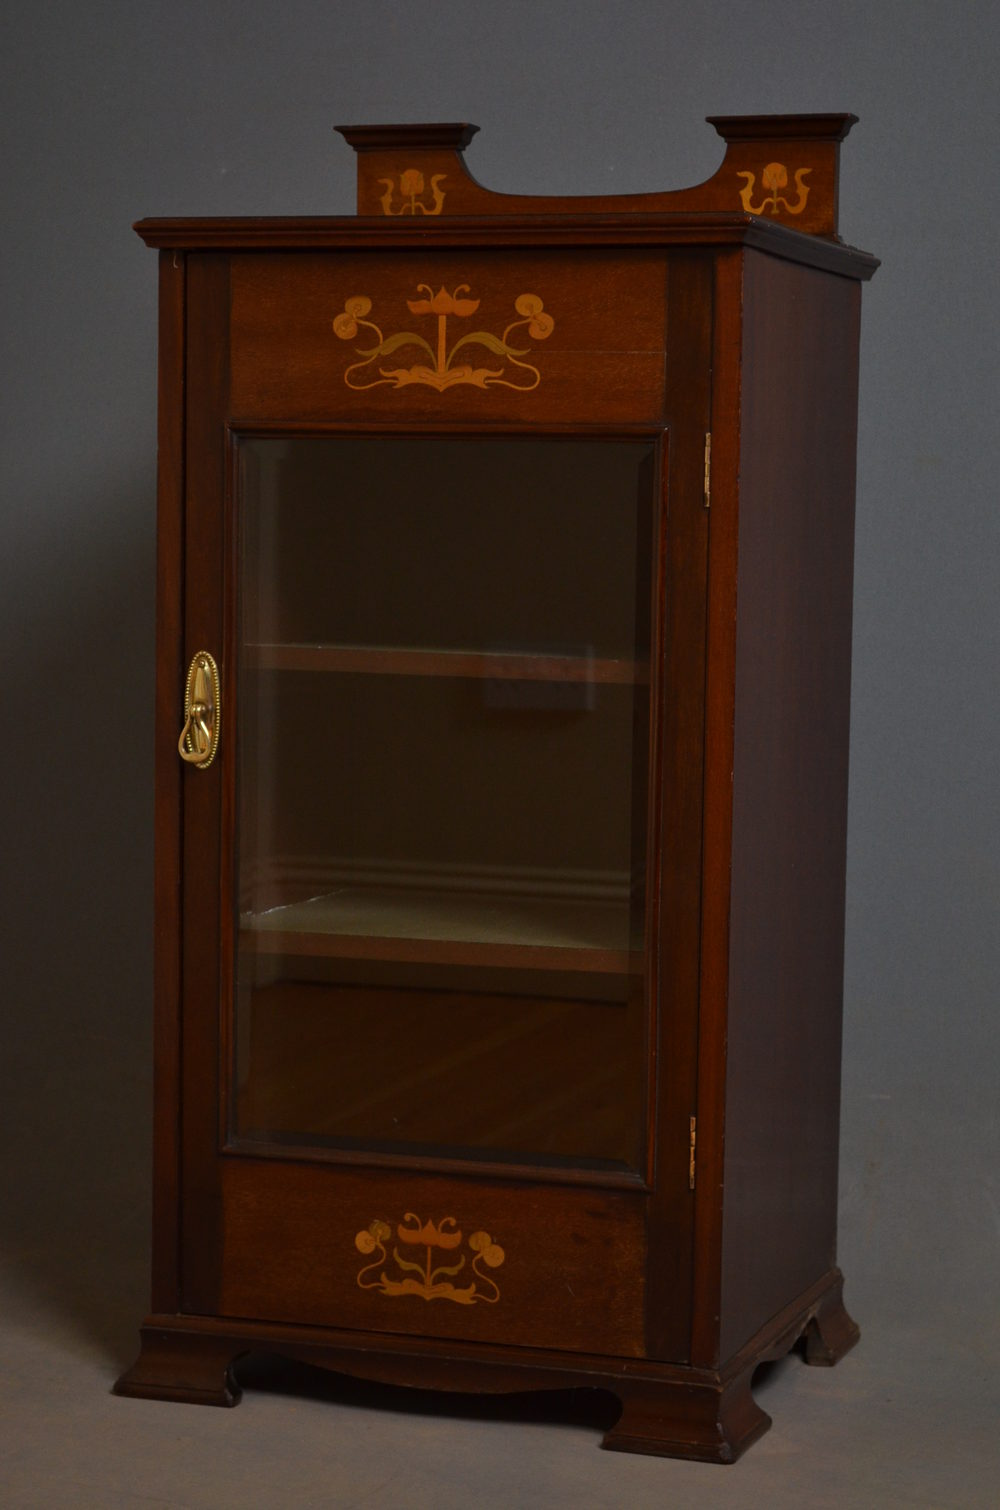 Antique Brass Cabinet Pulls